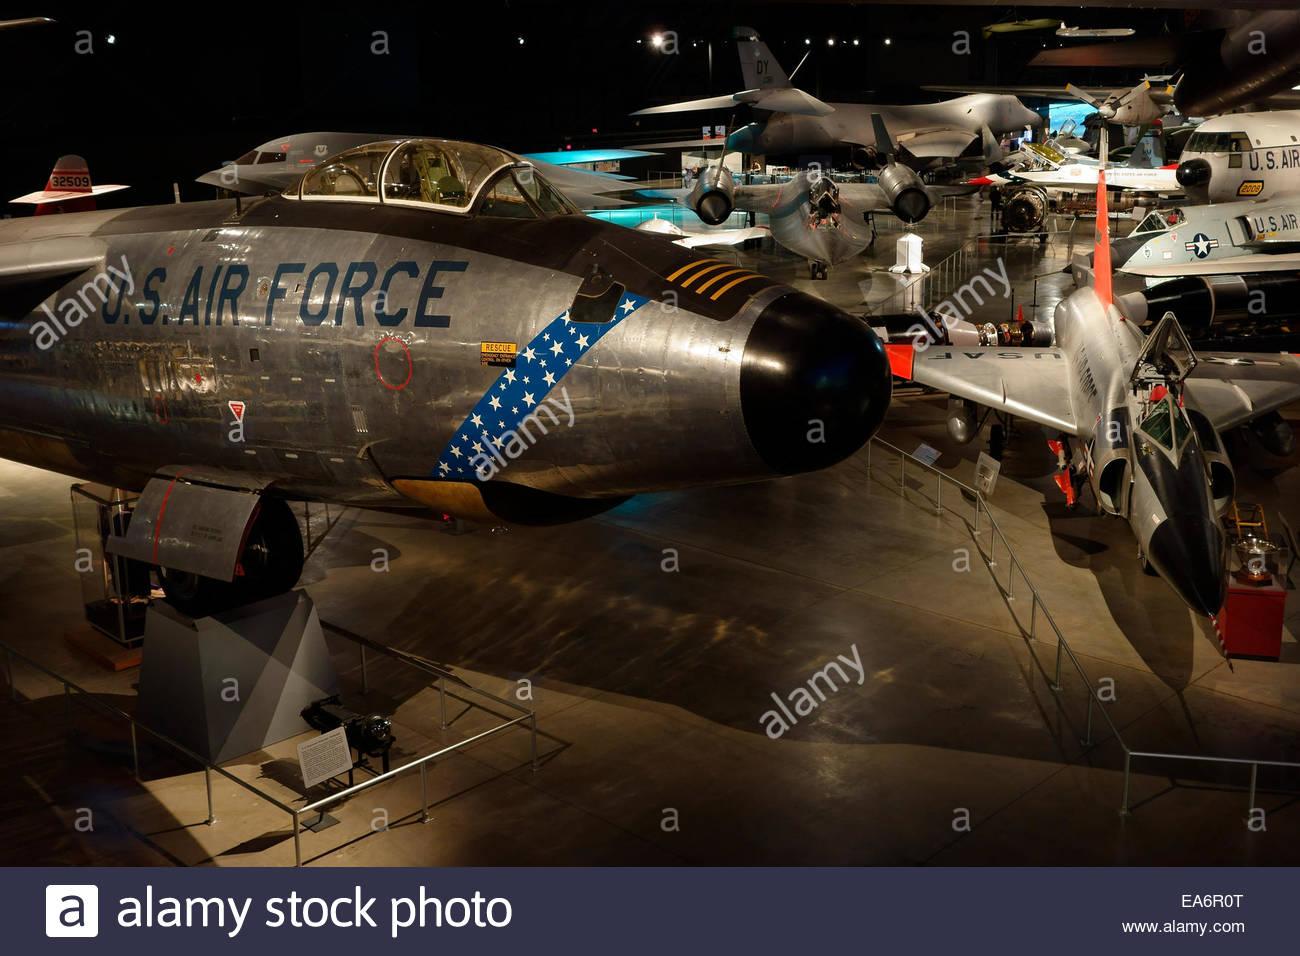 National Museum of the United States Air Force, Dayton, Ohio, USA - Stock Image